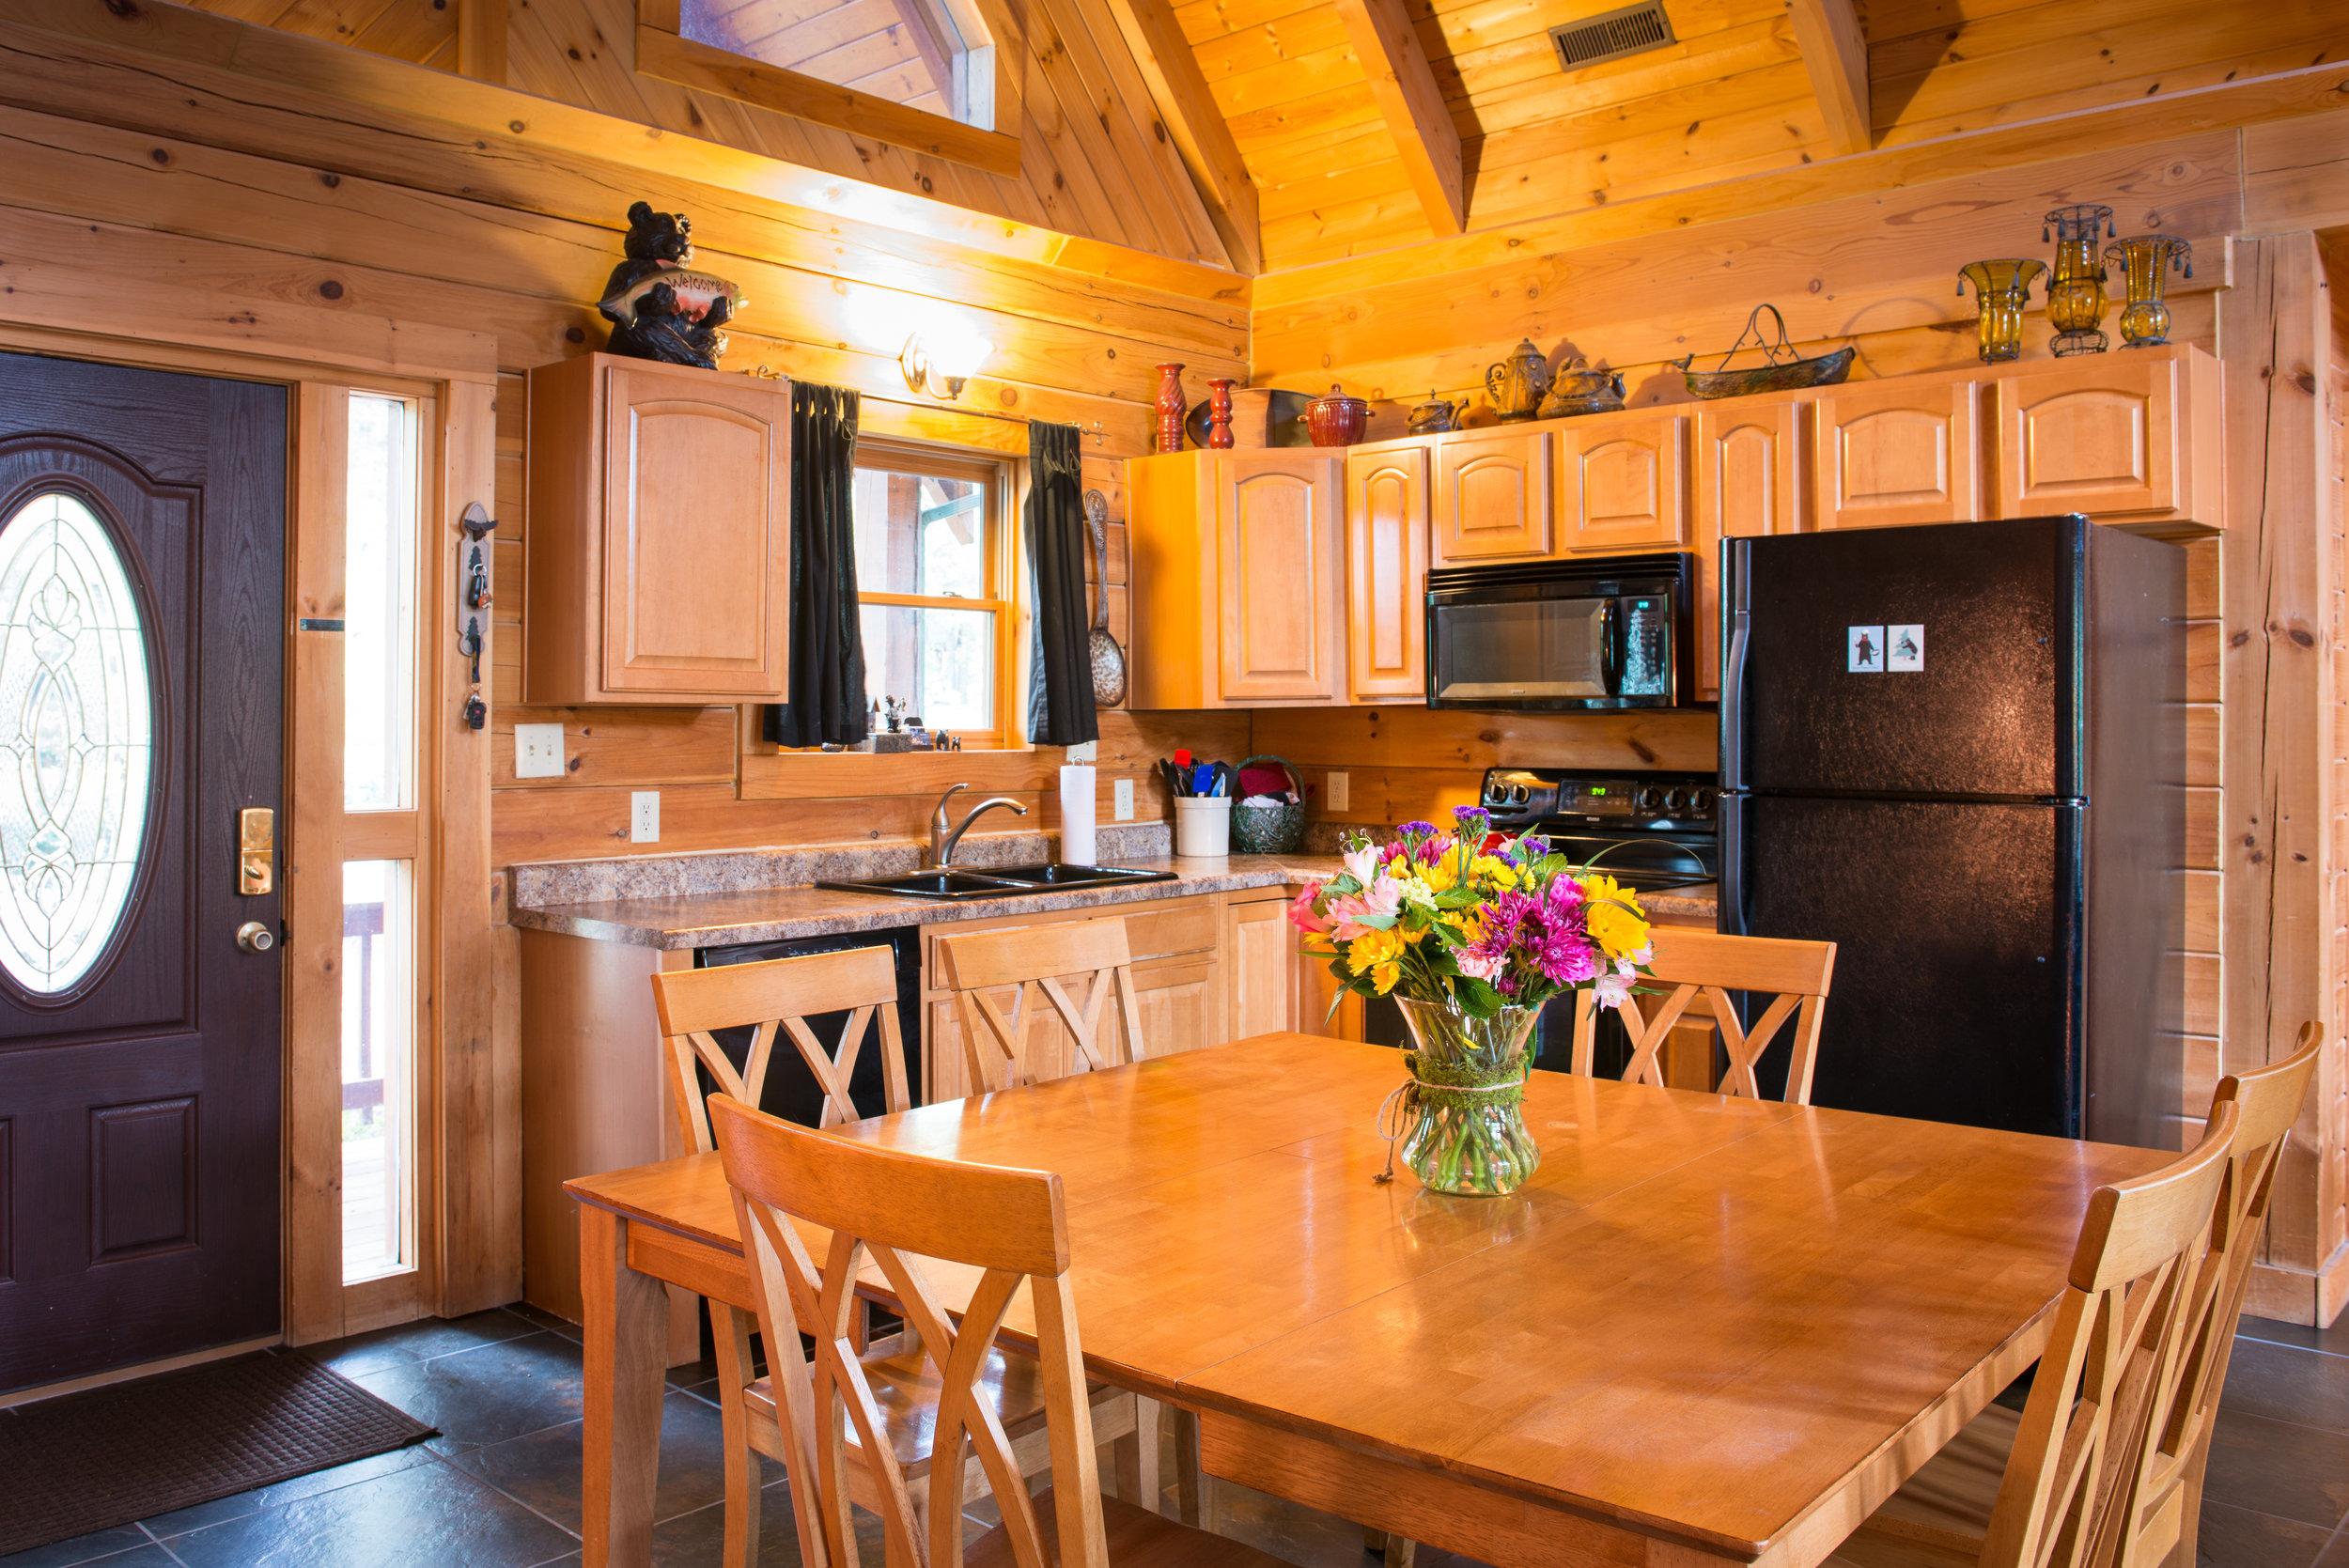 Branson_Bear_Kitchen_Table.jpg